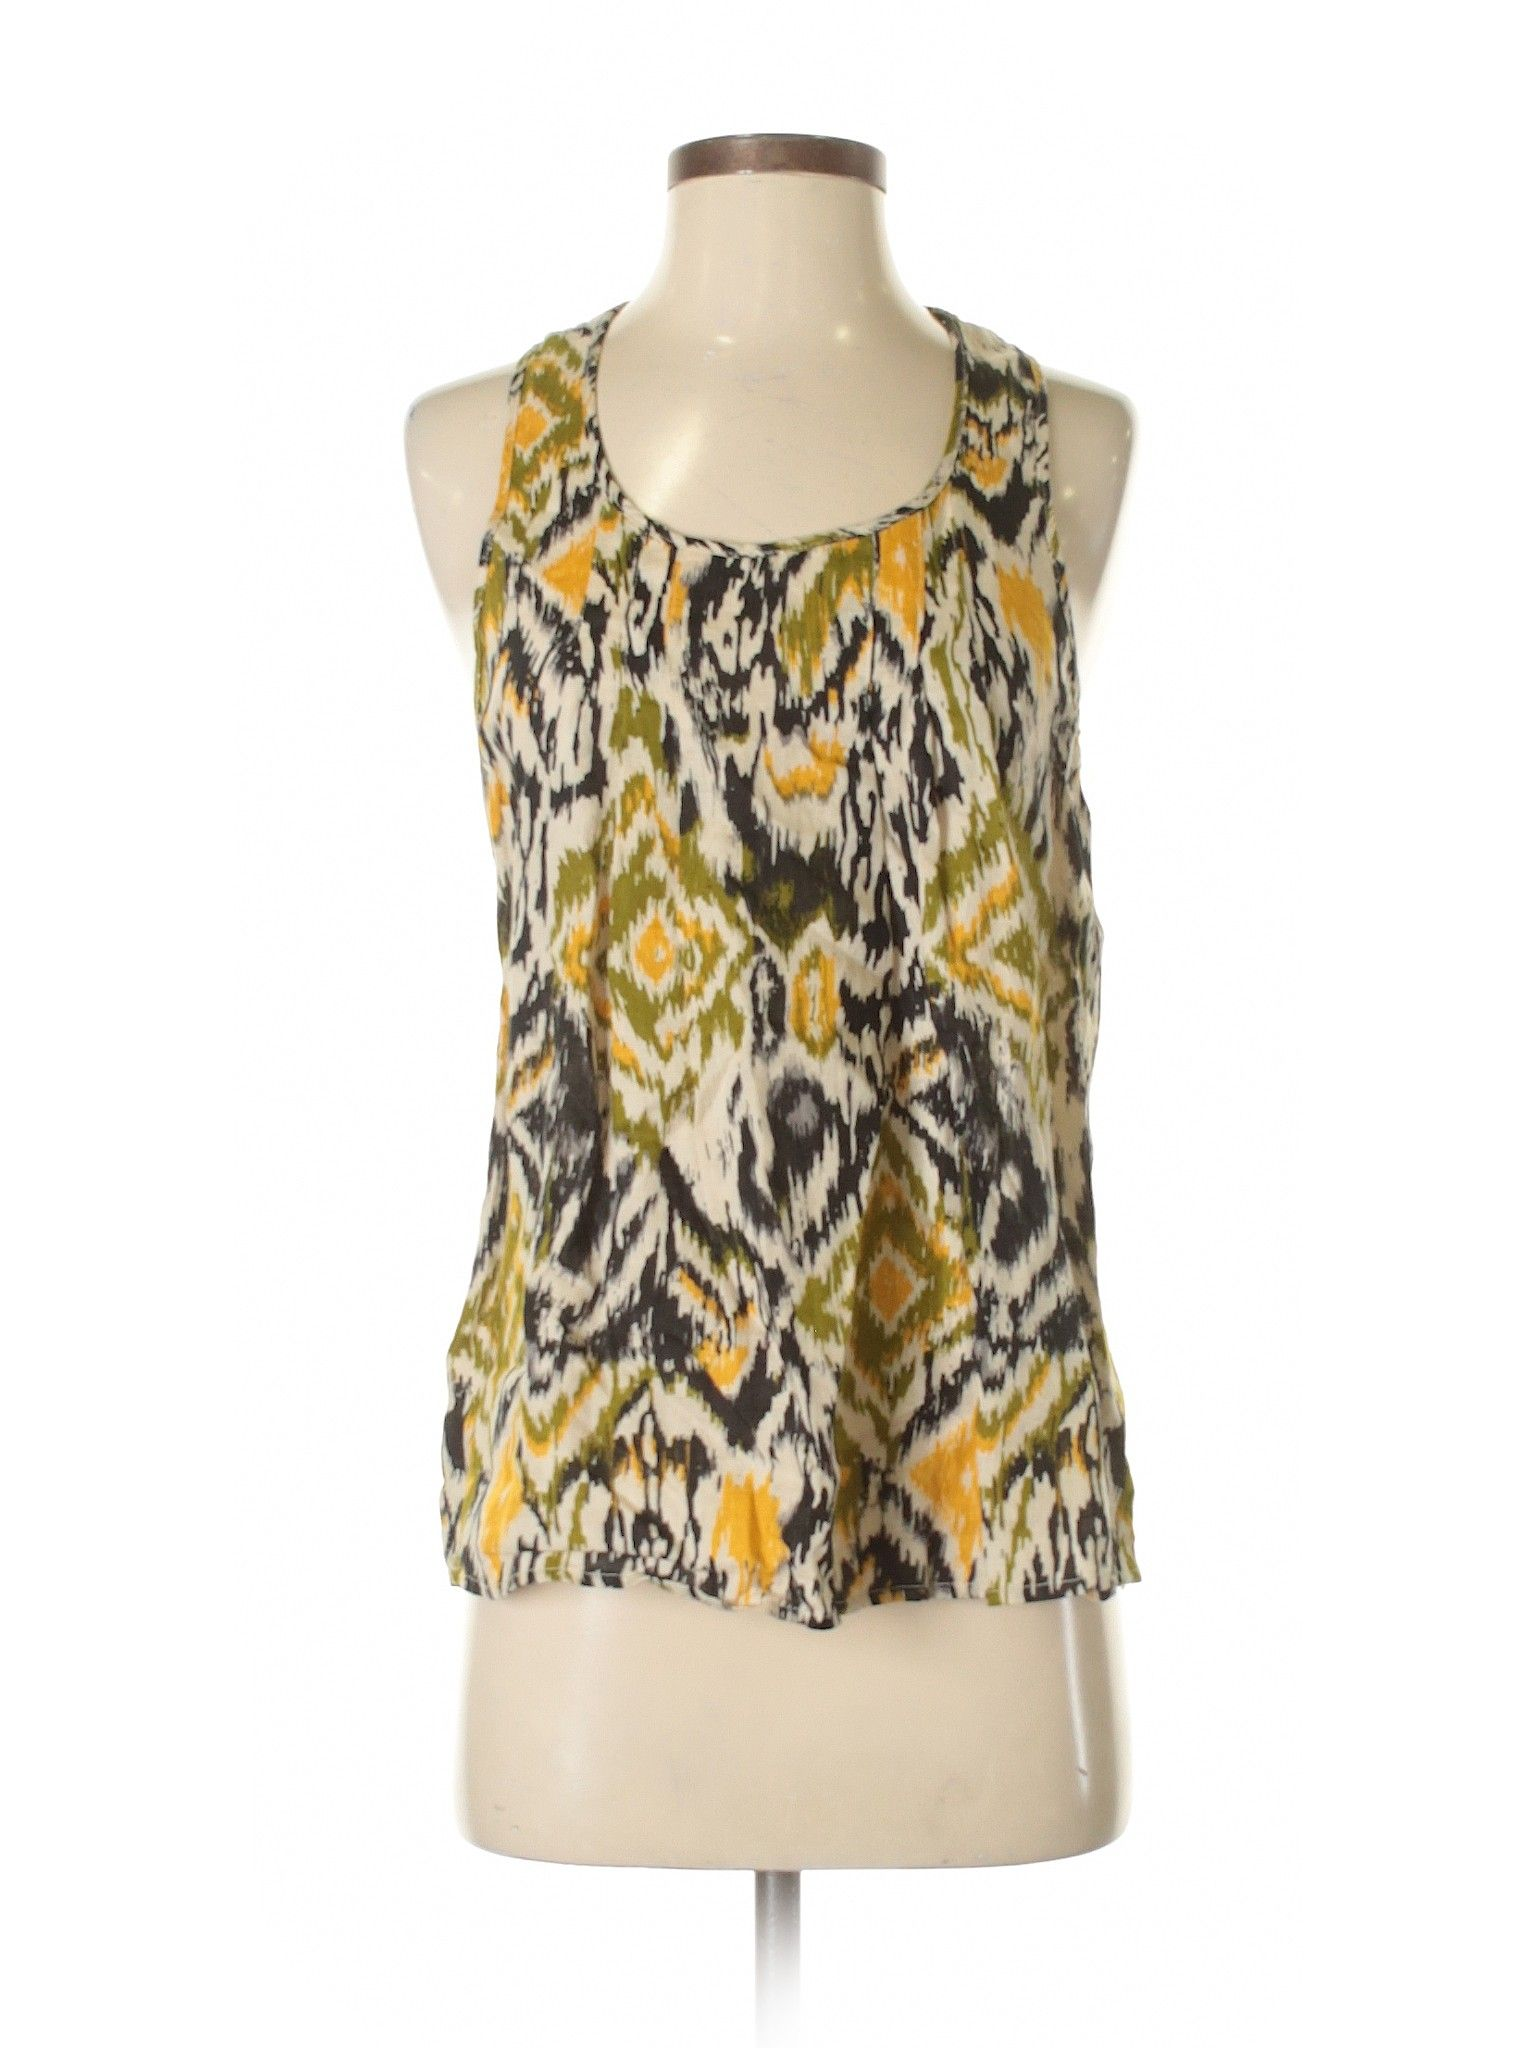 d12abd6949774 Cynthia Rowley for T.J. Maxx Sleeveless Blouse: Size 4.00 Green Women's  Tops - $12.99